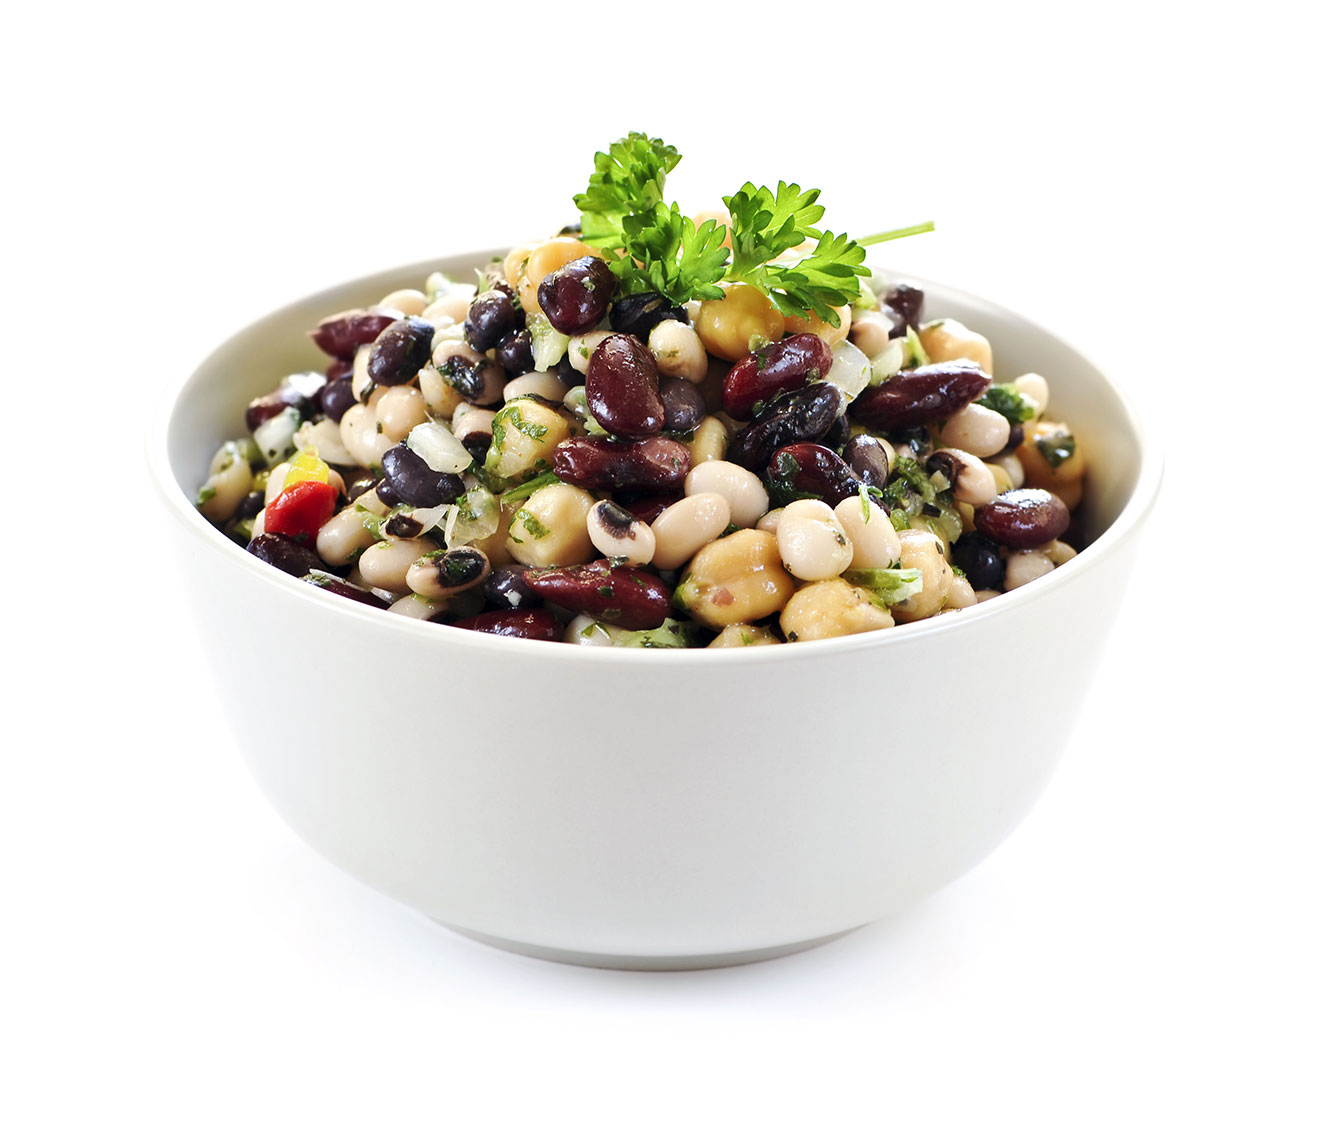 Enjoy legumes at least 2-3 times each week